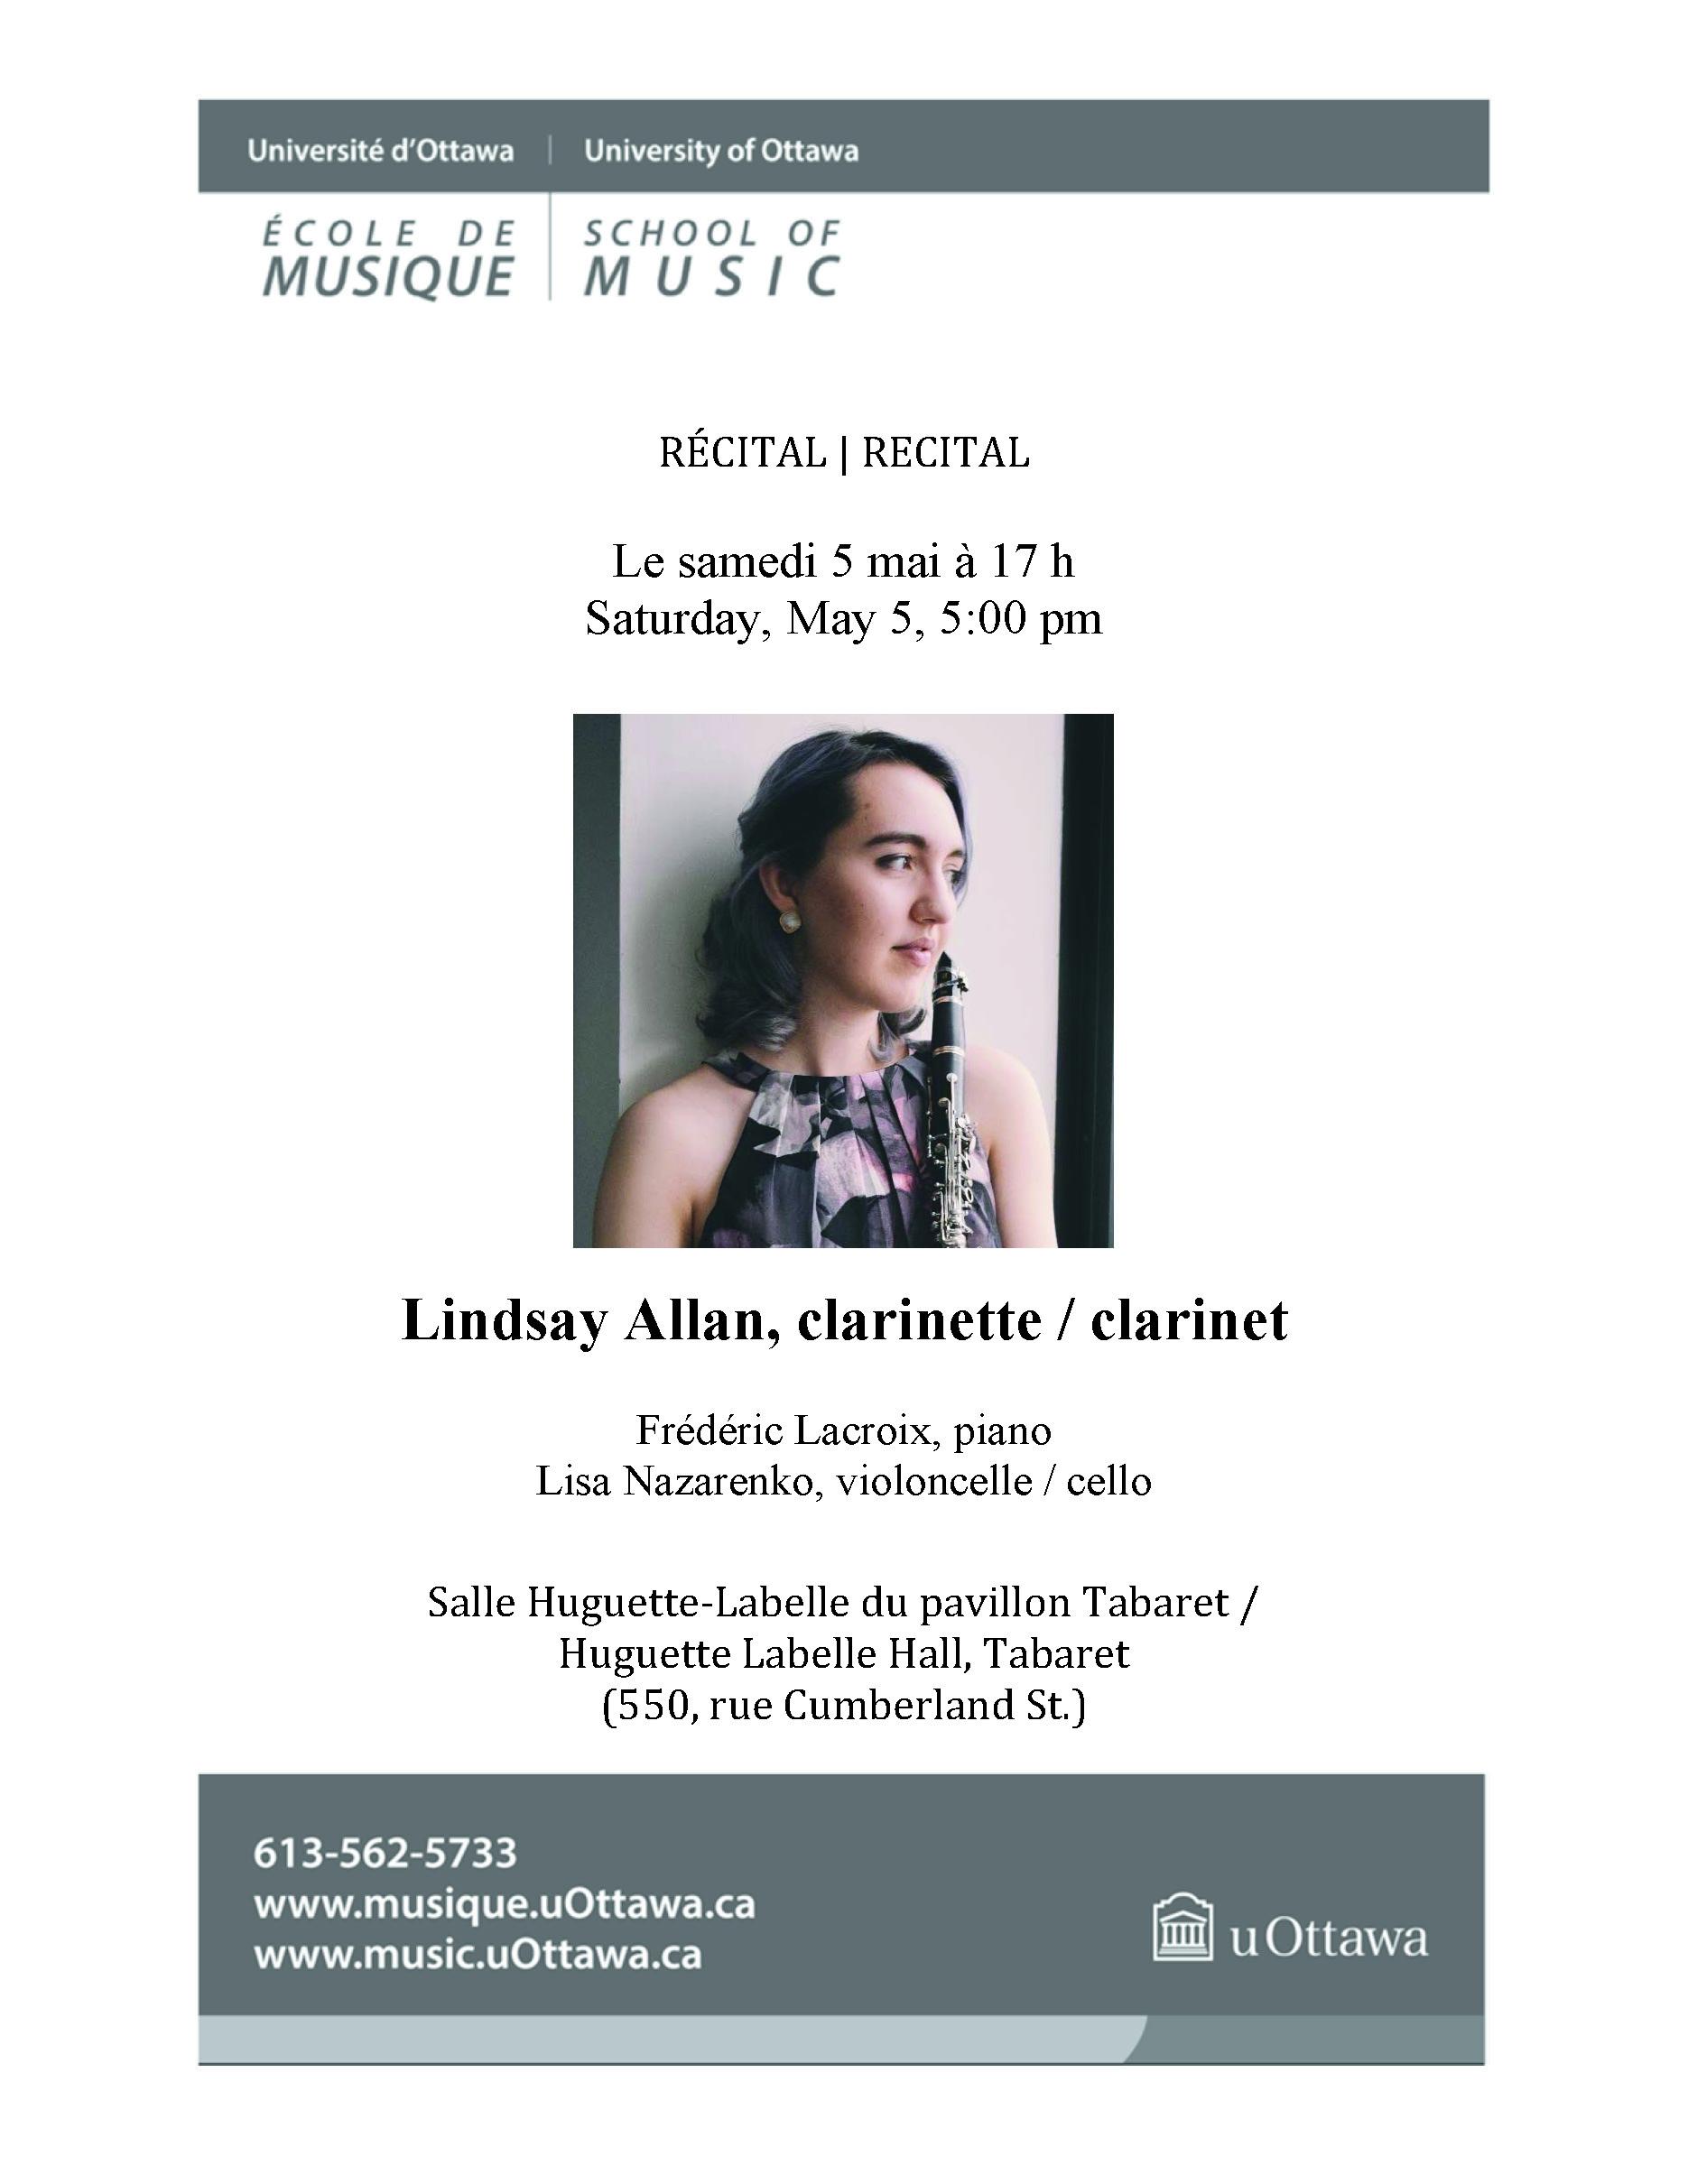 Page 1 of Lindsay Allan's recital program